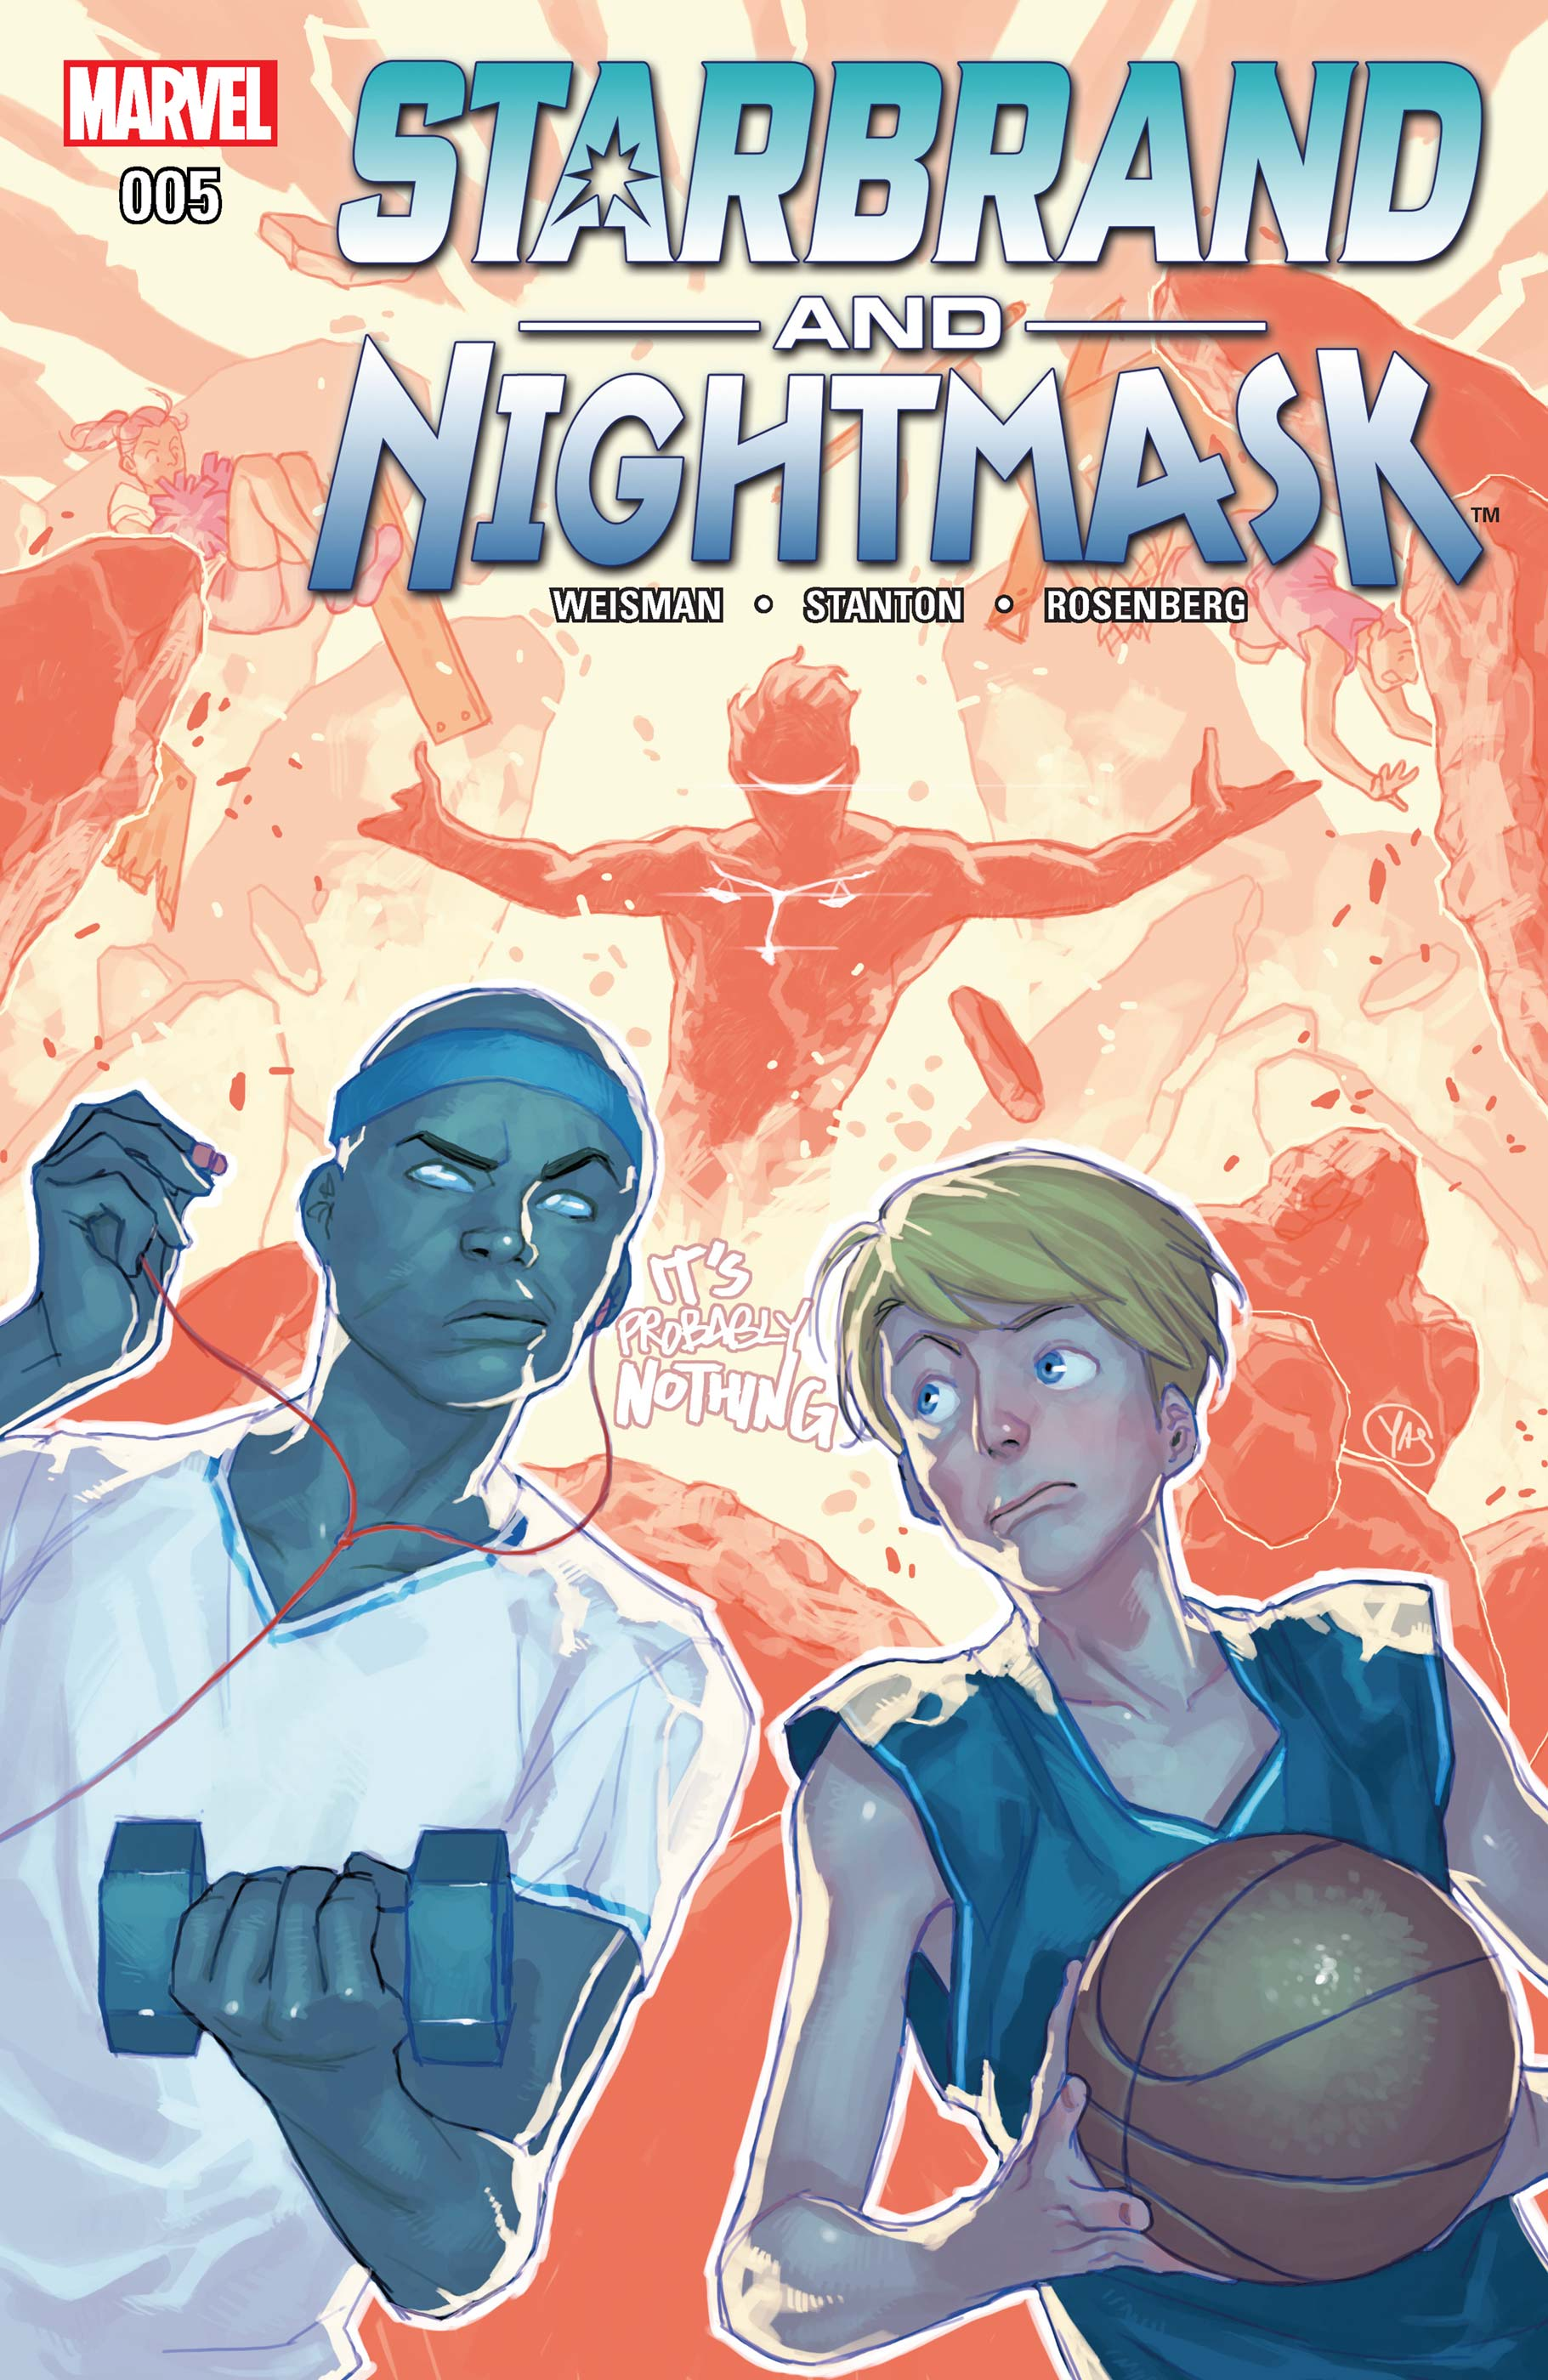 Starbrand & Nightmask (2015) #5